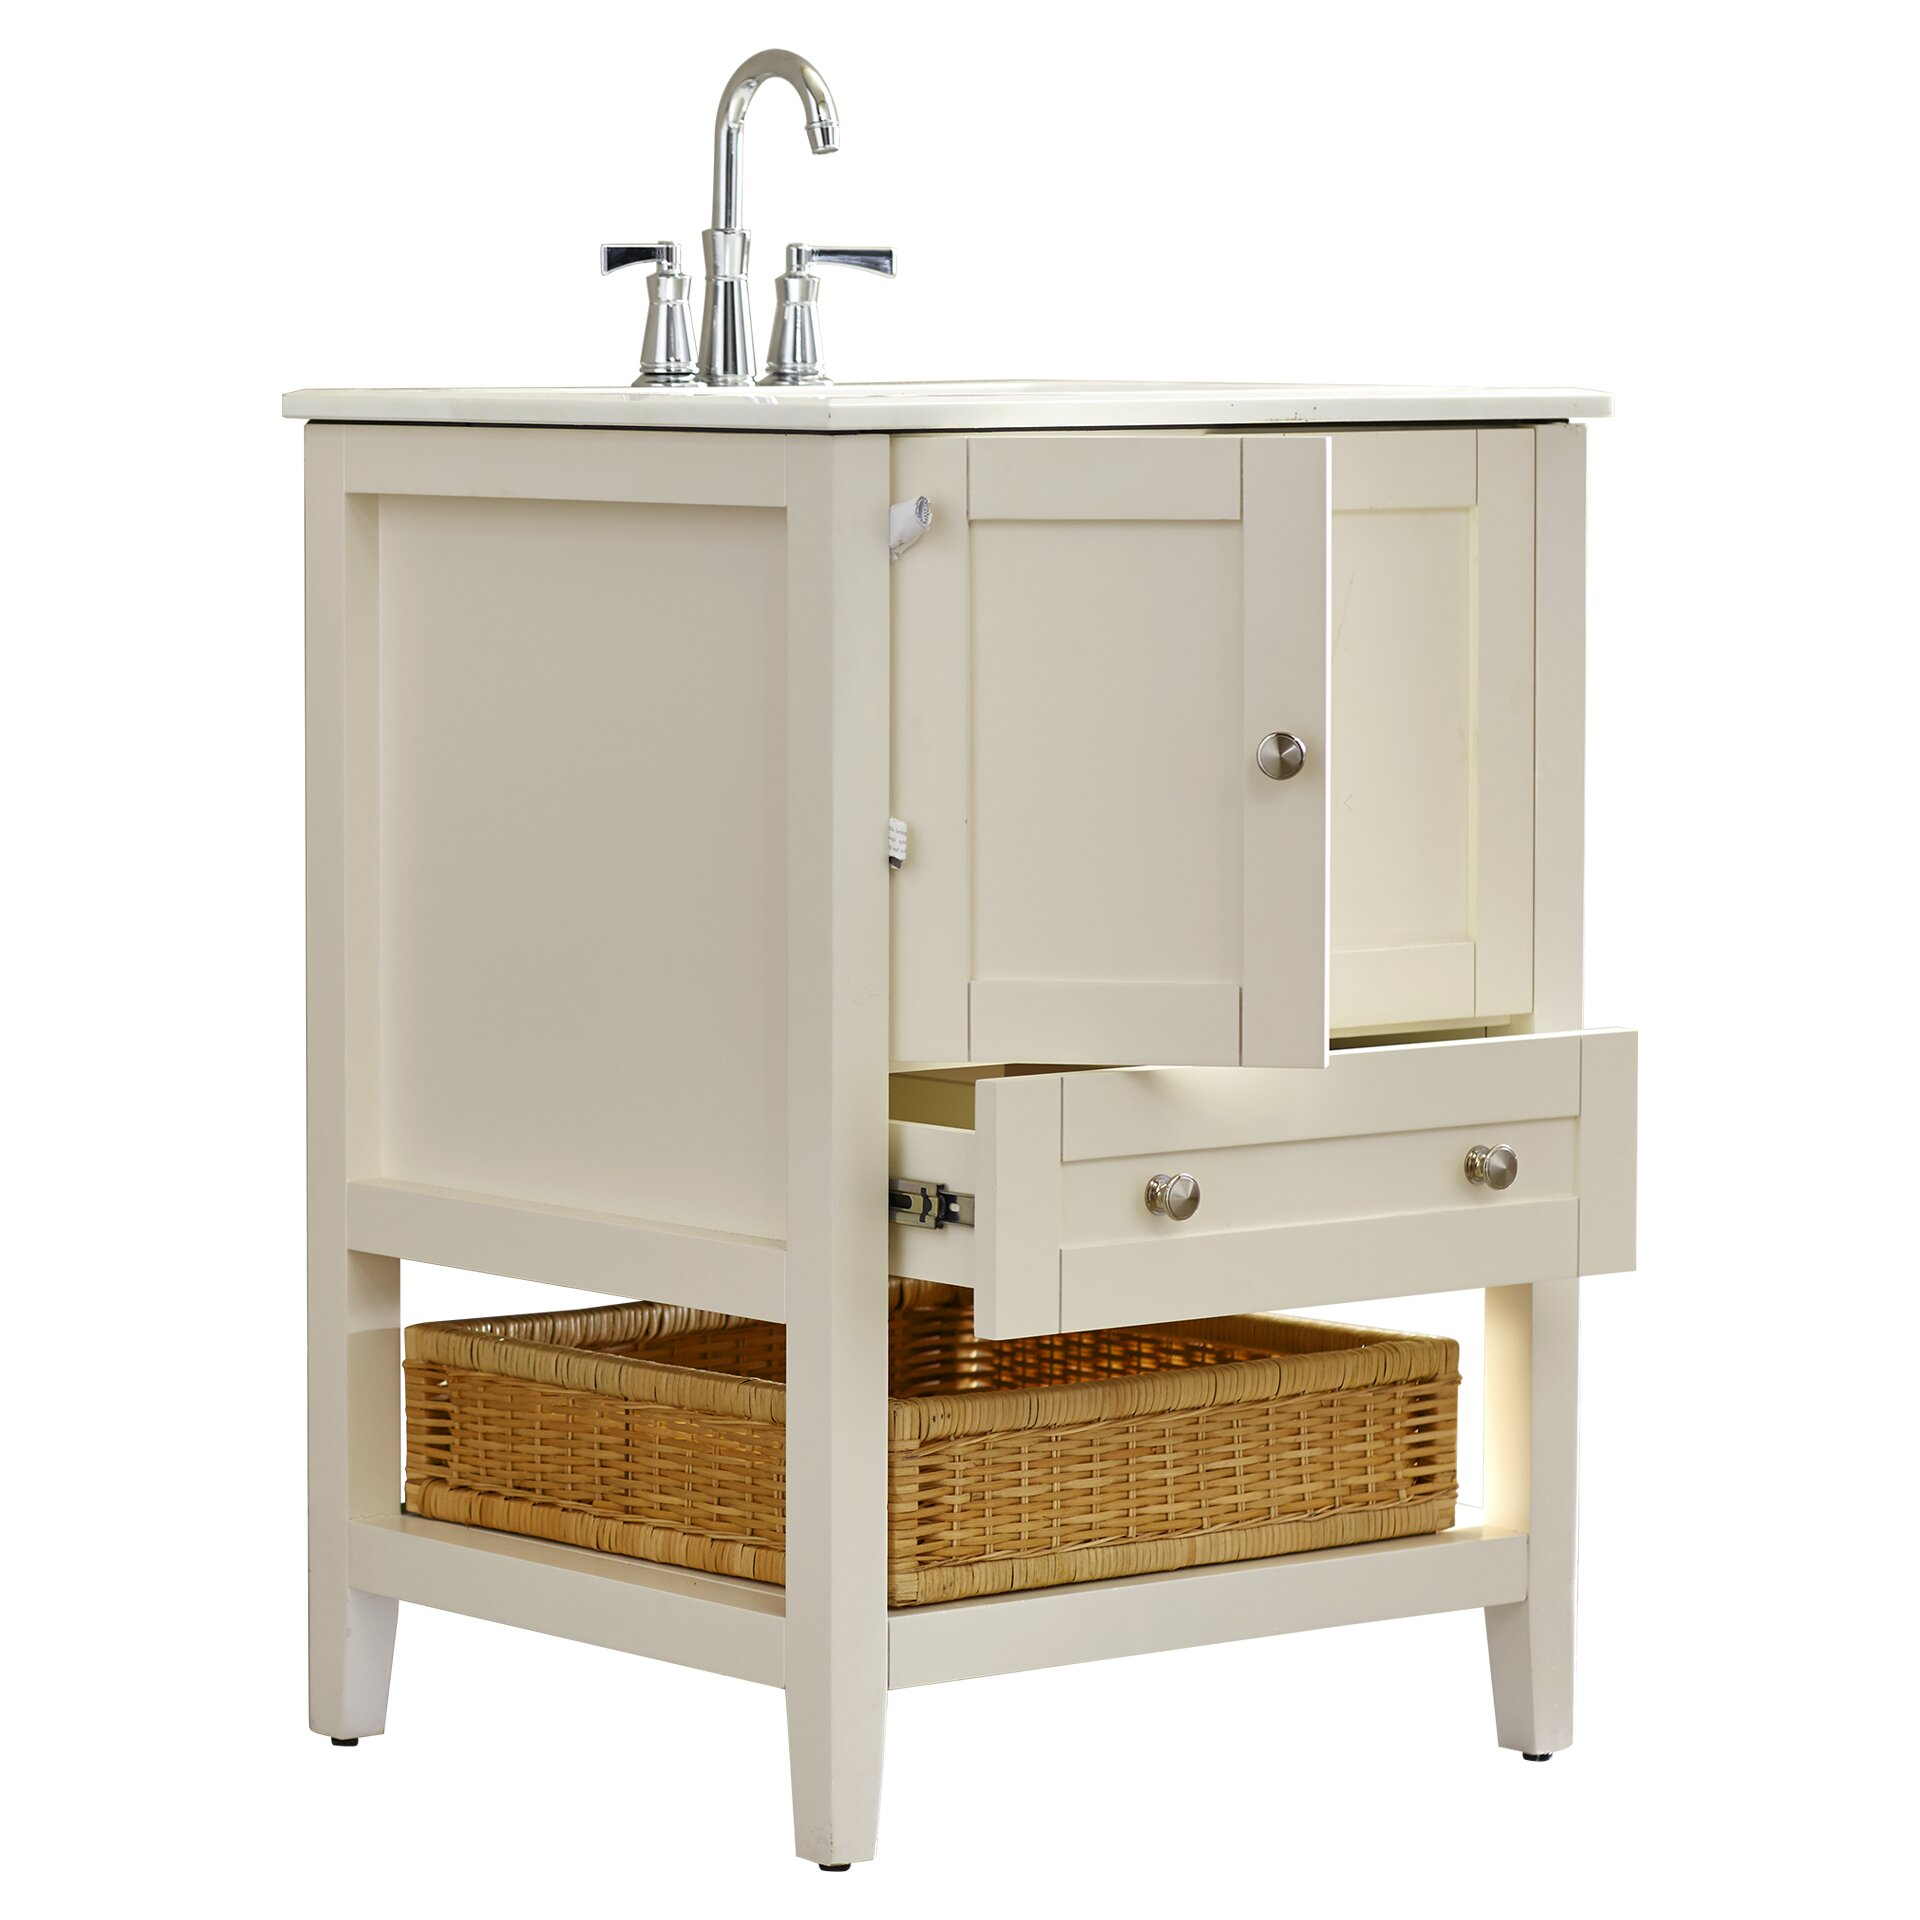 "Beachcrest Home Margot 25"" Single Bathroom Vanity Set"